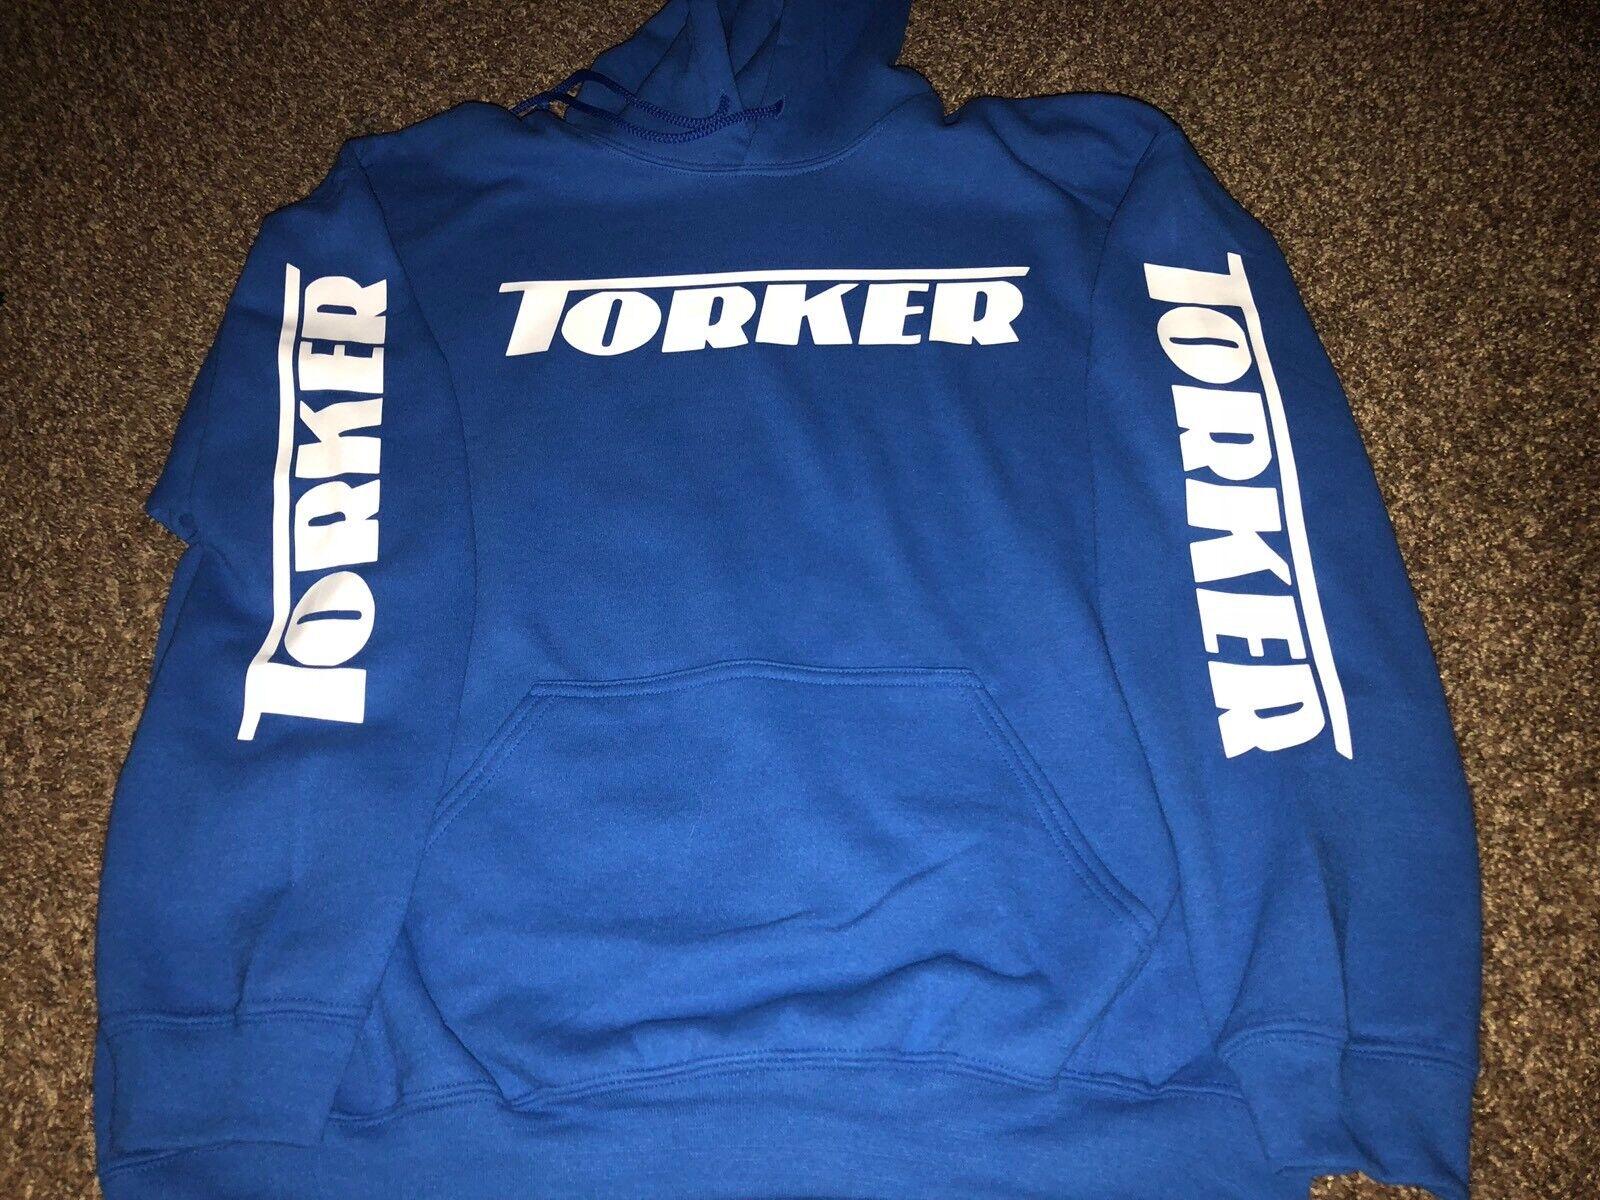 Old School Bmx Torker 2 540 Hoodie 2XL Haro,Dyno,Redline,Skyway,Kuwahara,Jmc,